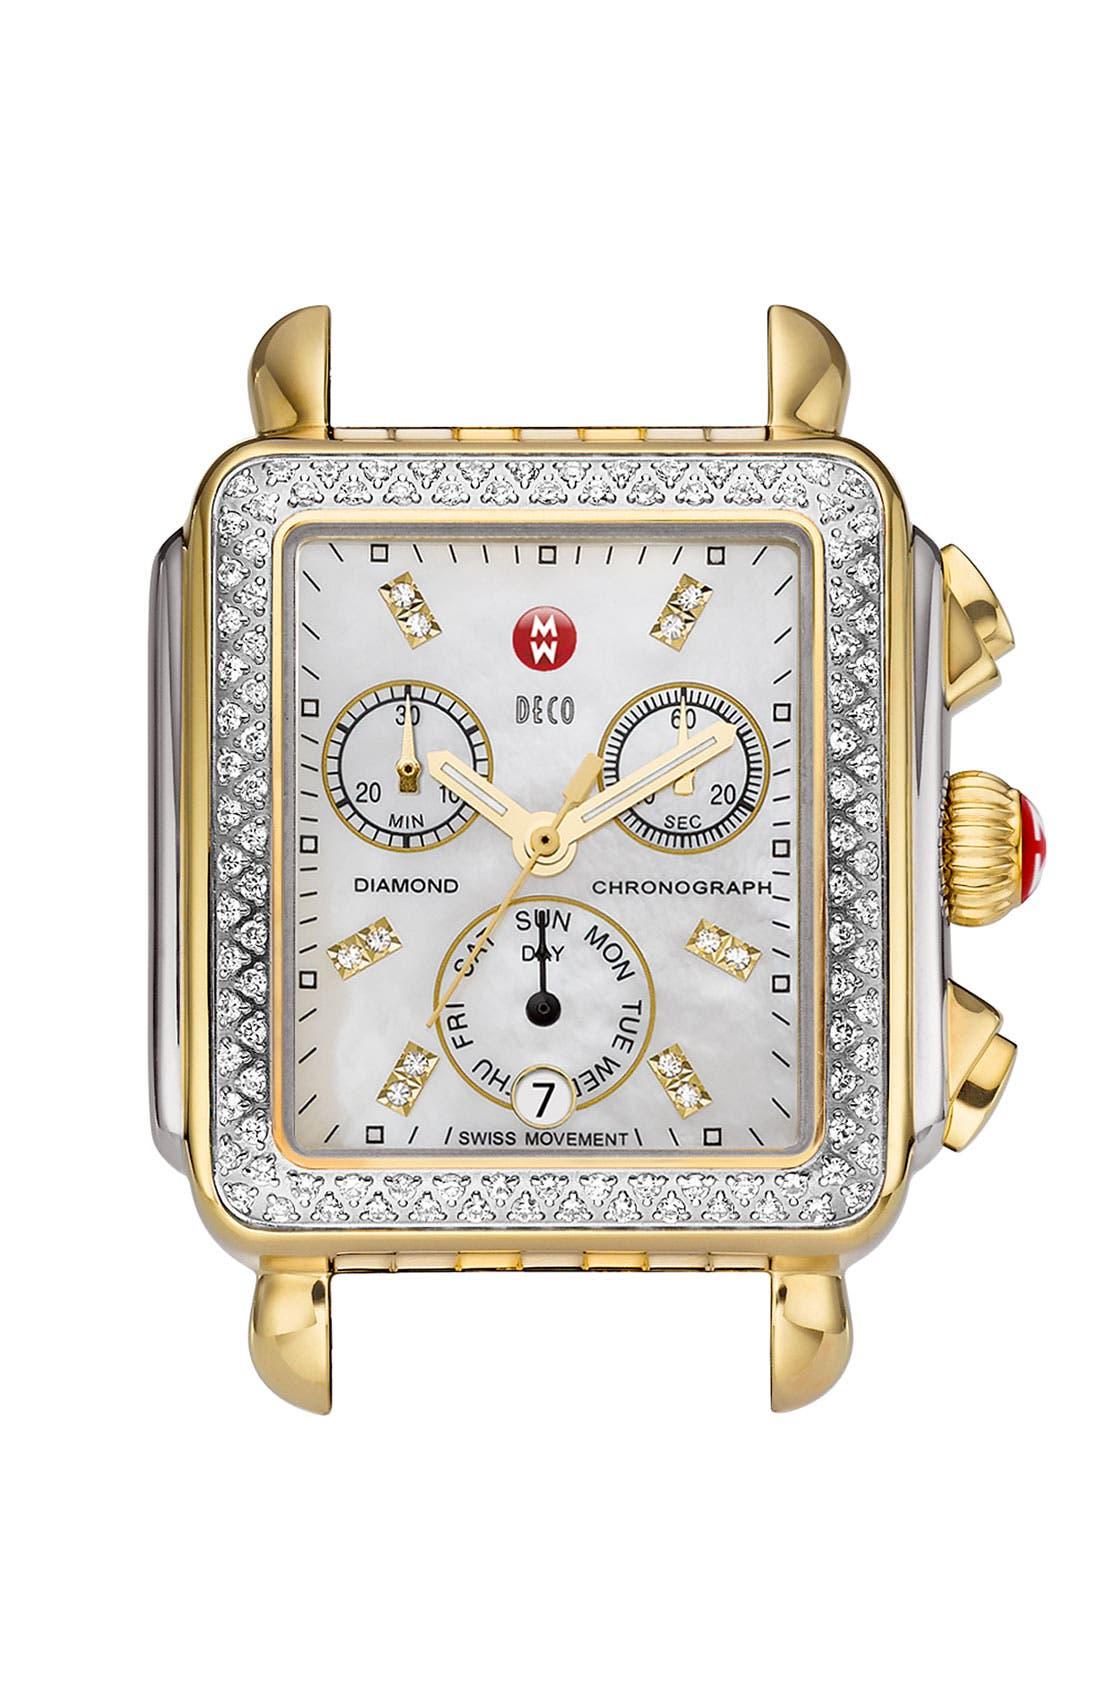 Main Image - MICHELE 'Deco Diamond' Two-Tone Watch Case & 18mm Patent Leather Strap